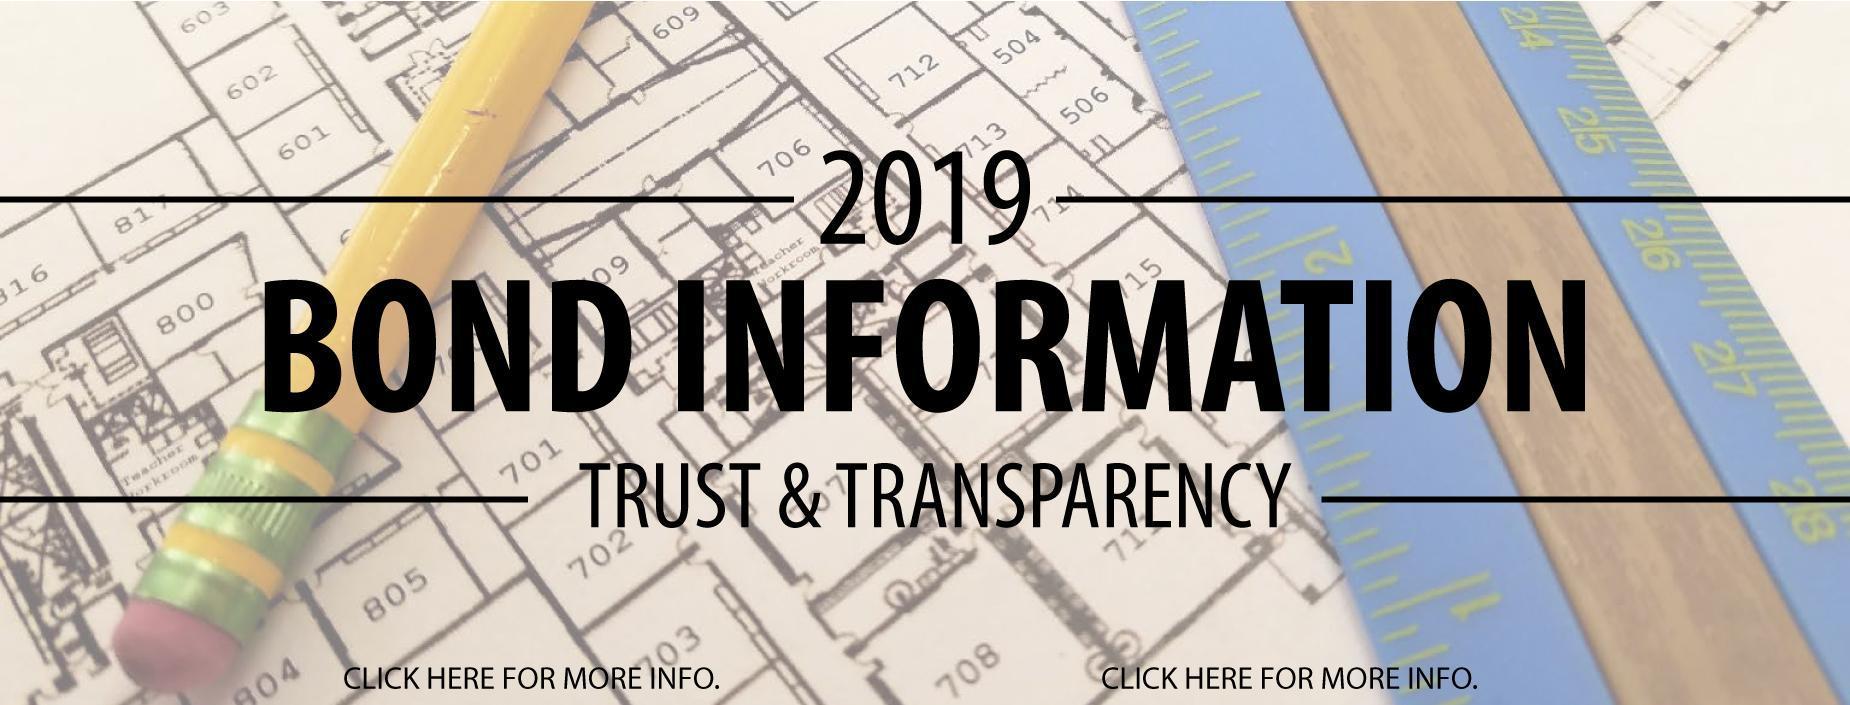 2019 Bond Information Banner